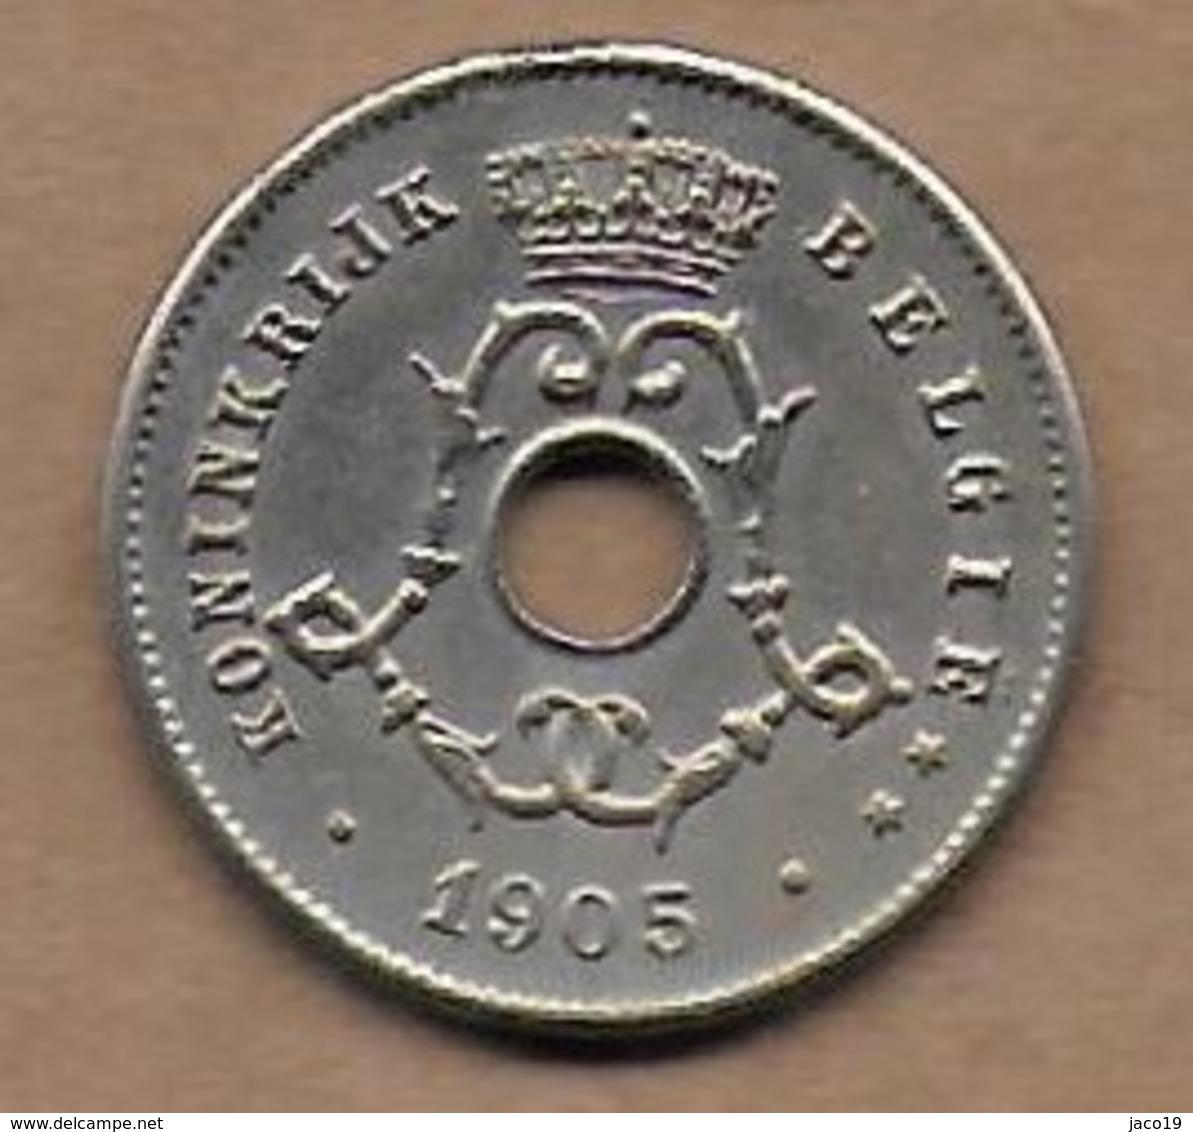 5 Centimes 1905 FL - 03. 5 Centimes